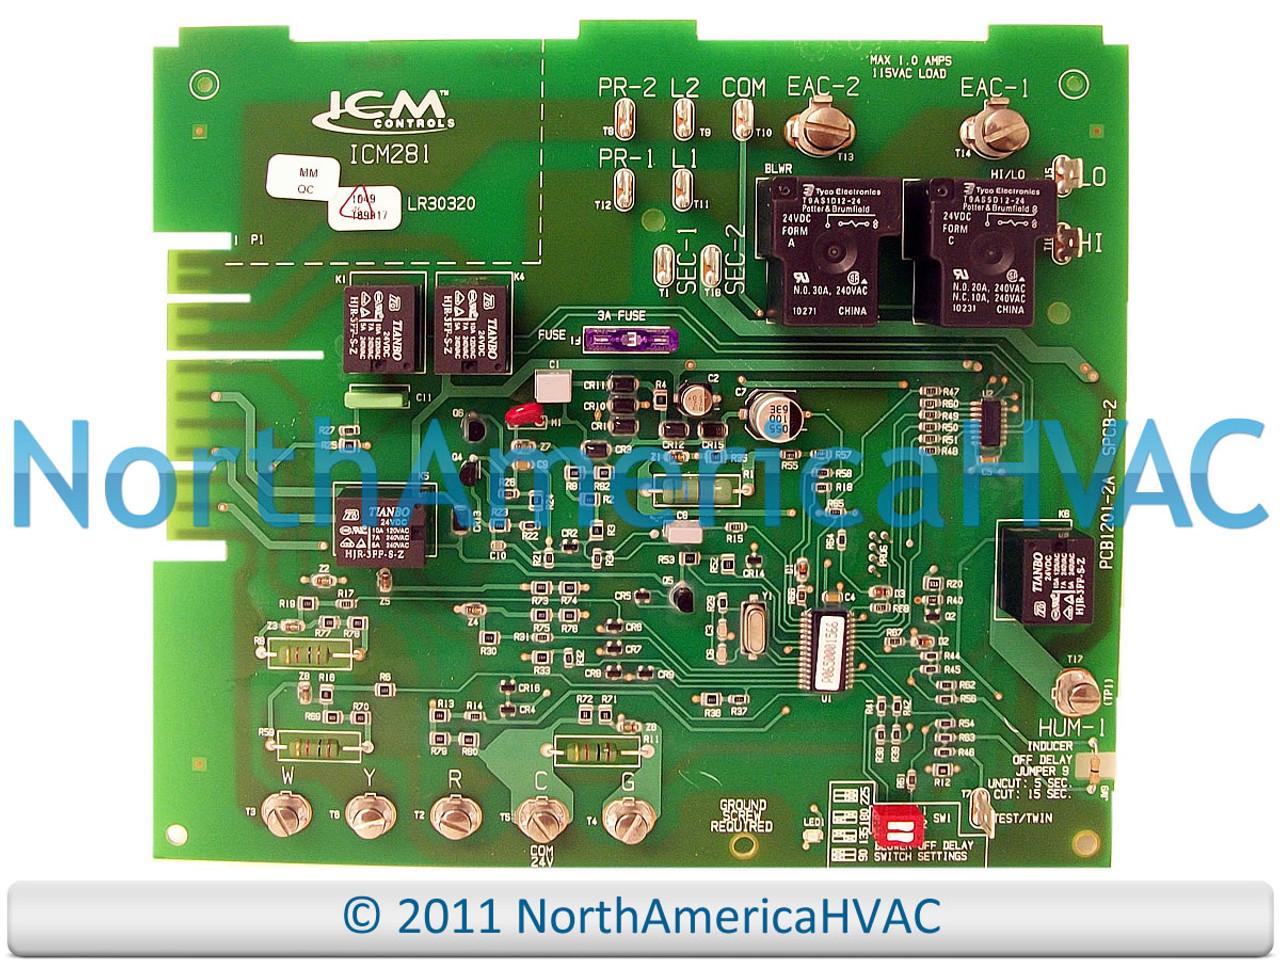 [SCHEMATICS_4US]  Carrier Bryant Payne Furnace Control Board HH84AA016 - North America HVAC | Bryant Defrost Circuit Board Wiring Diagram |  | North America HVAC